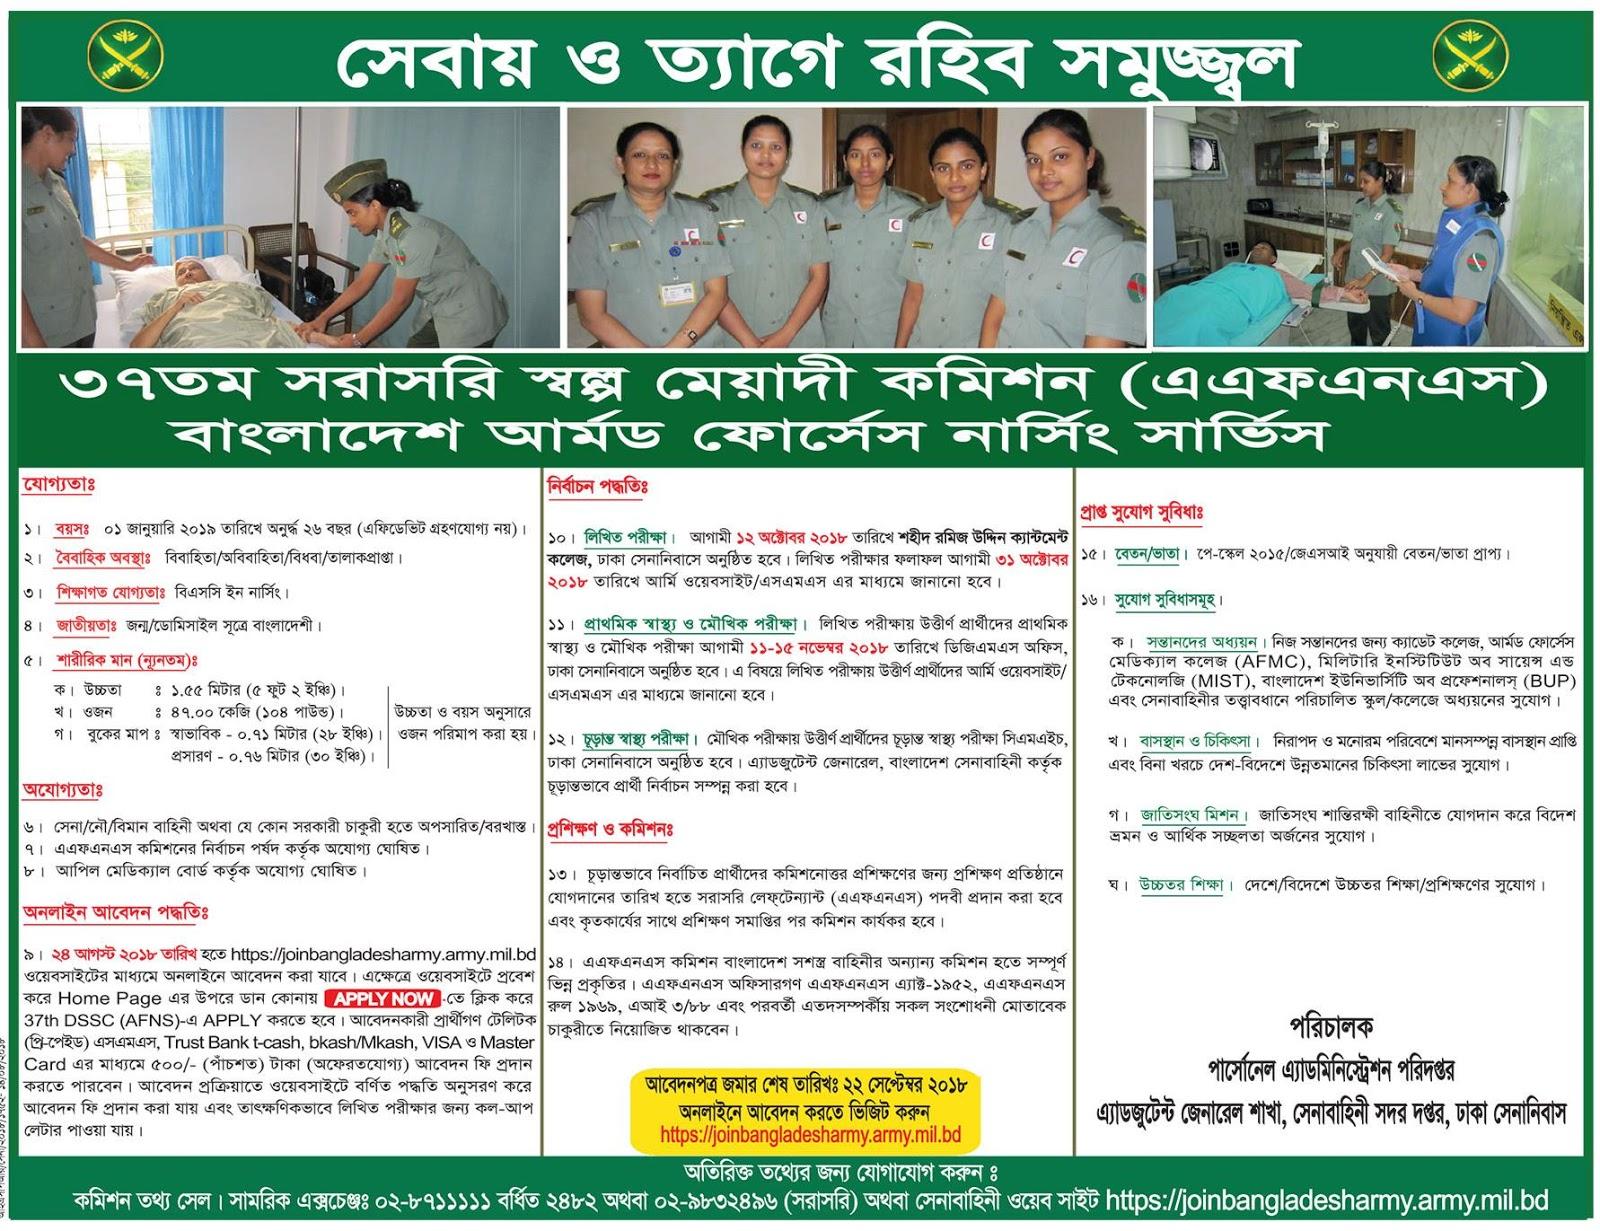 37ST Armed Forces Nursing Service (AFNS) Nurse Recruitment Circular 2018